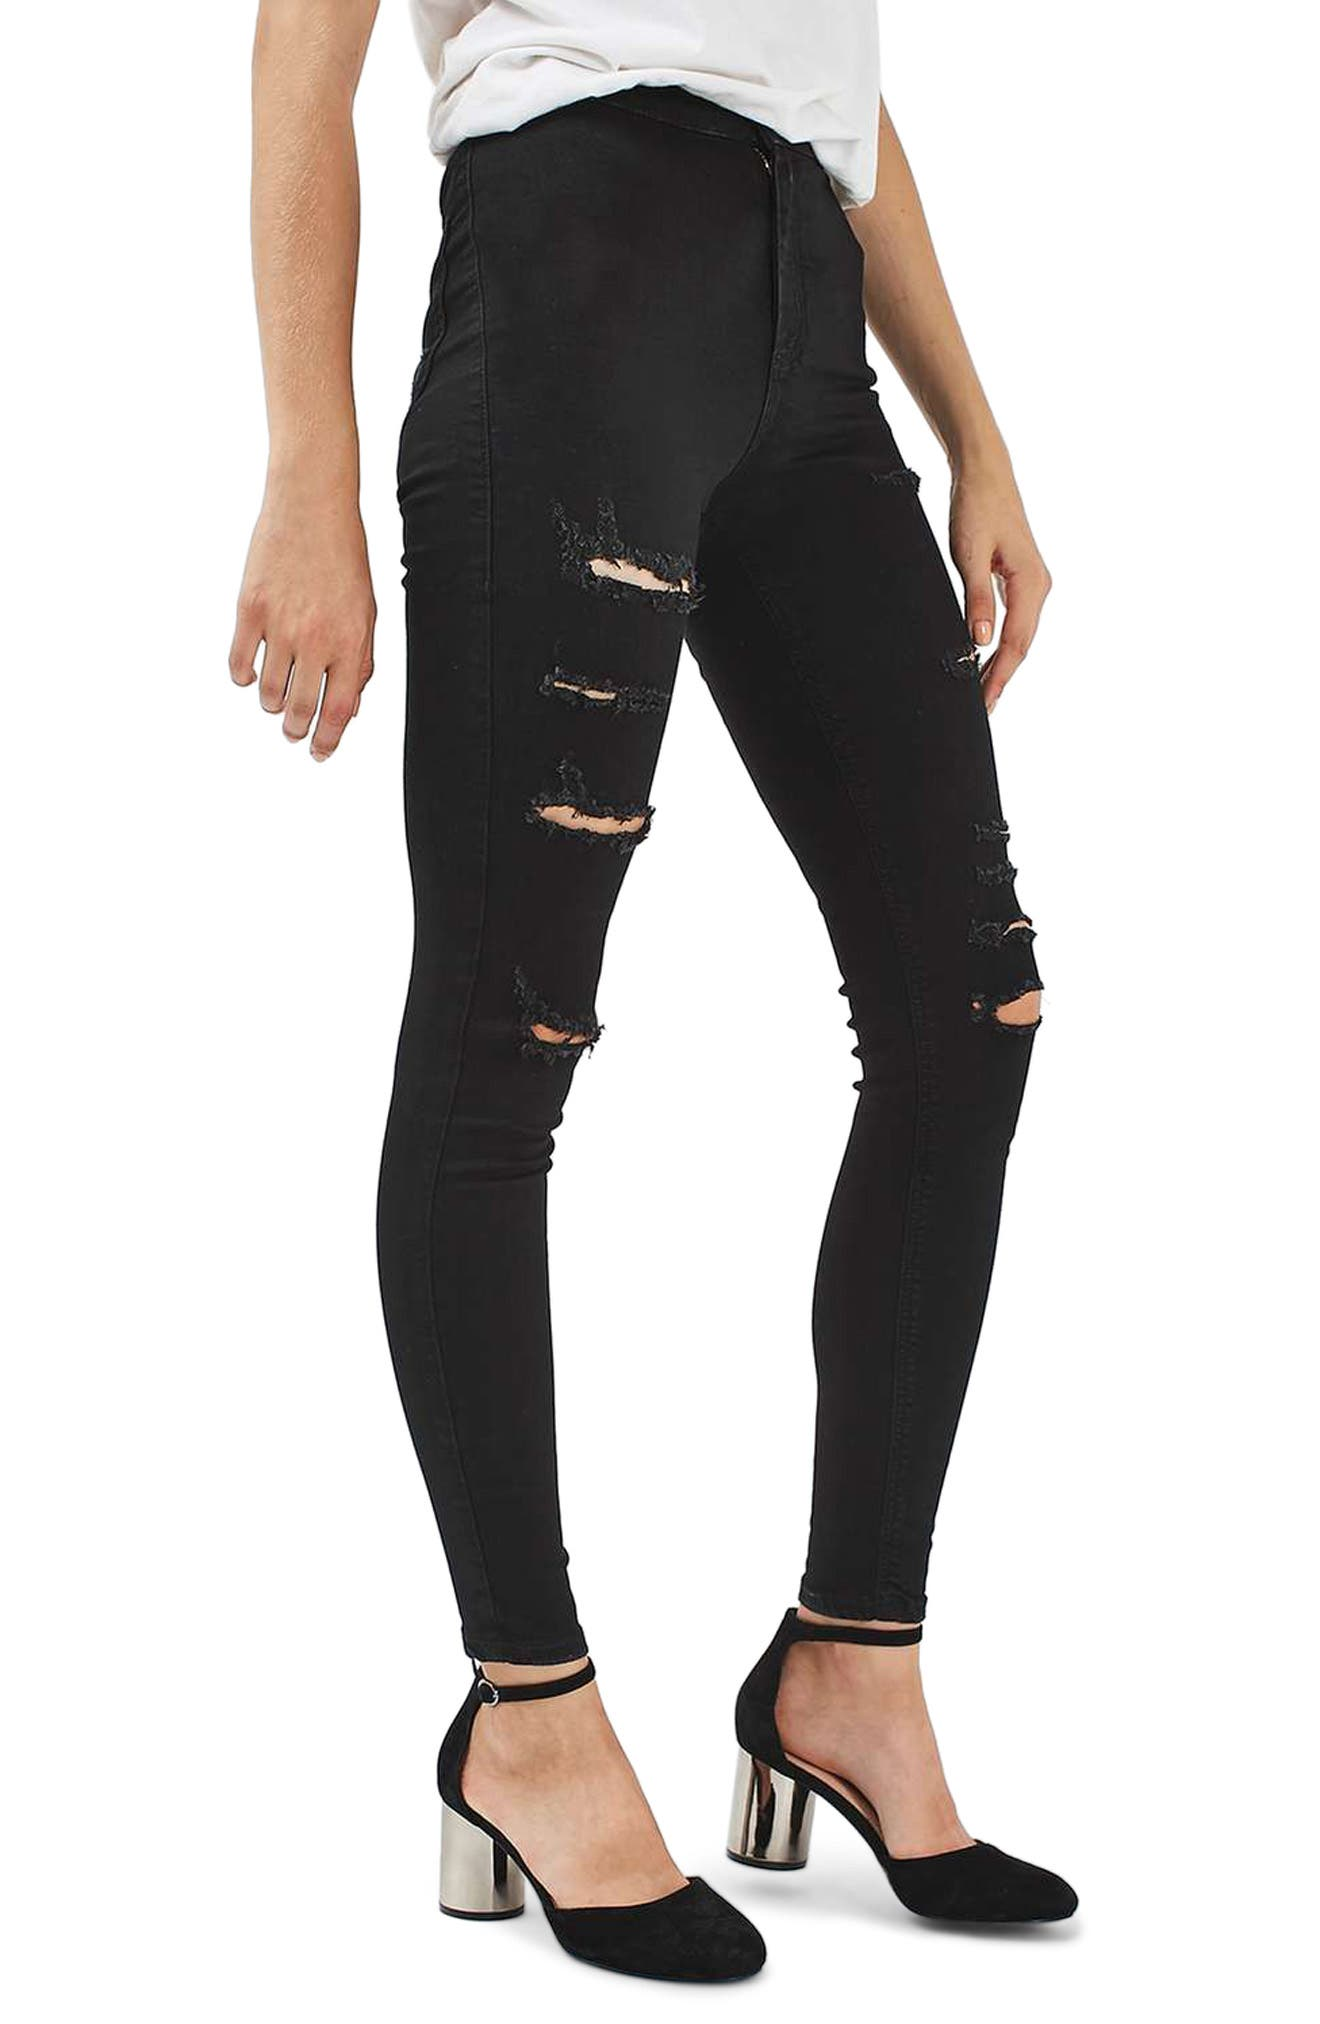 Topshop Joni Super Rip Crop Skinny Jeans